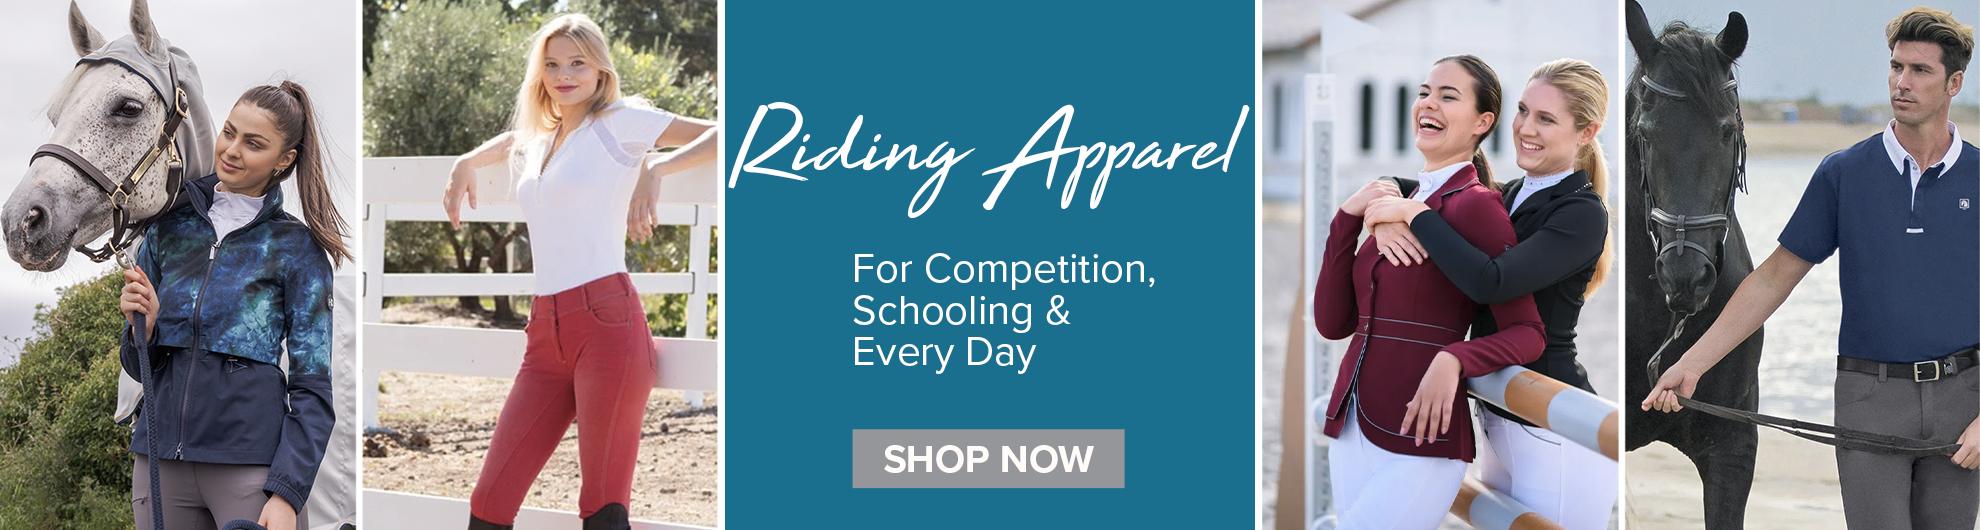 Riding Apparel